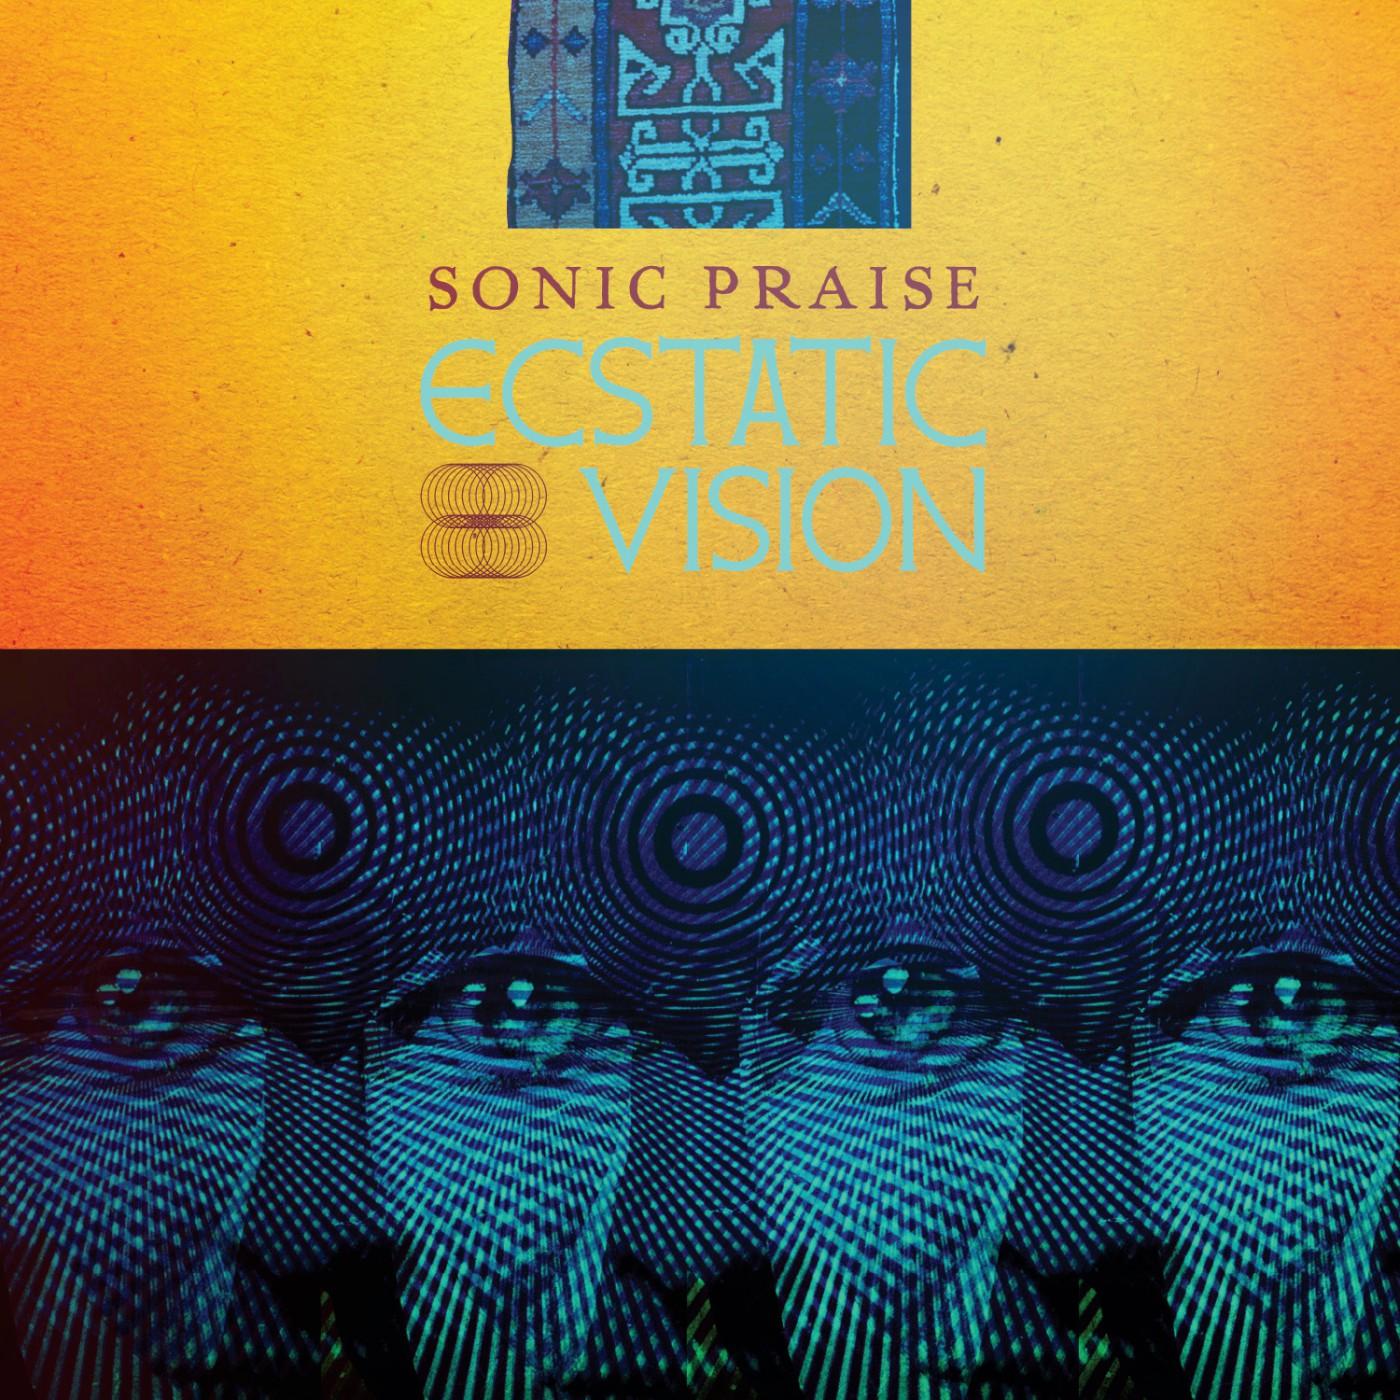 ecstatic vision sonic praise